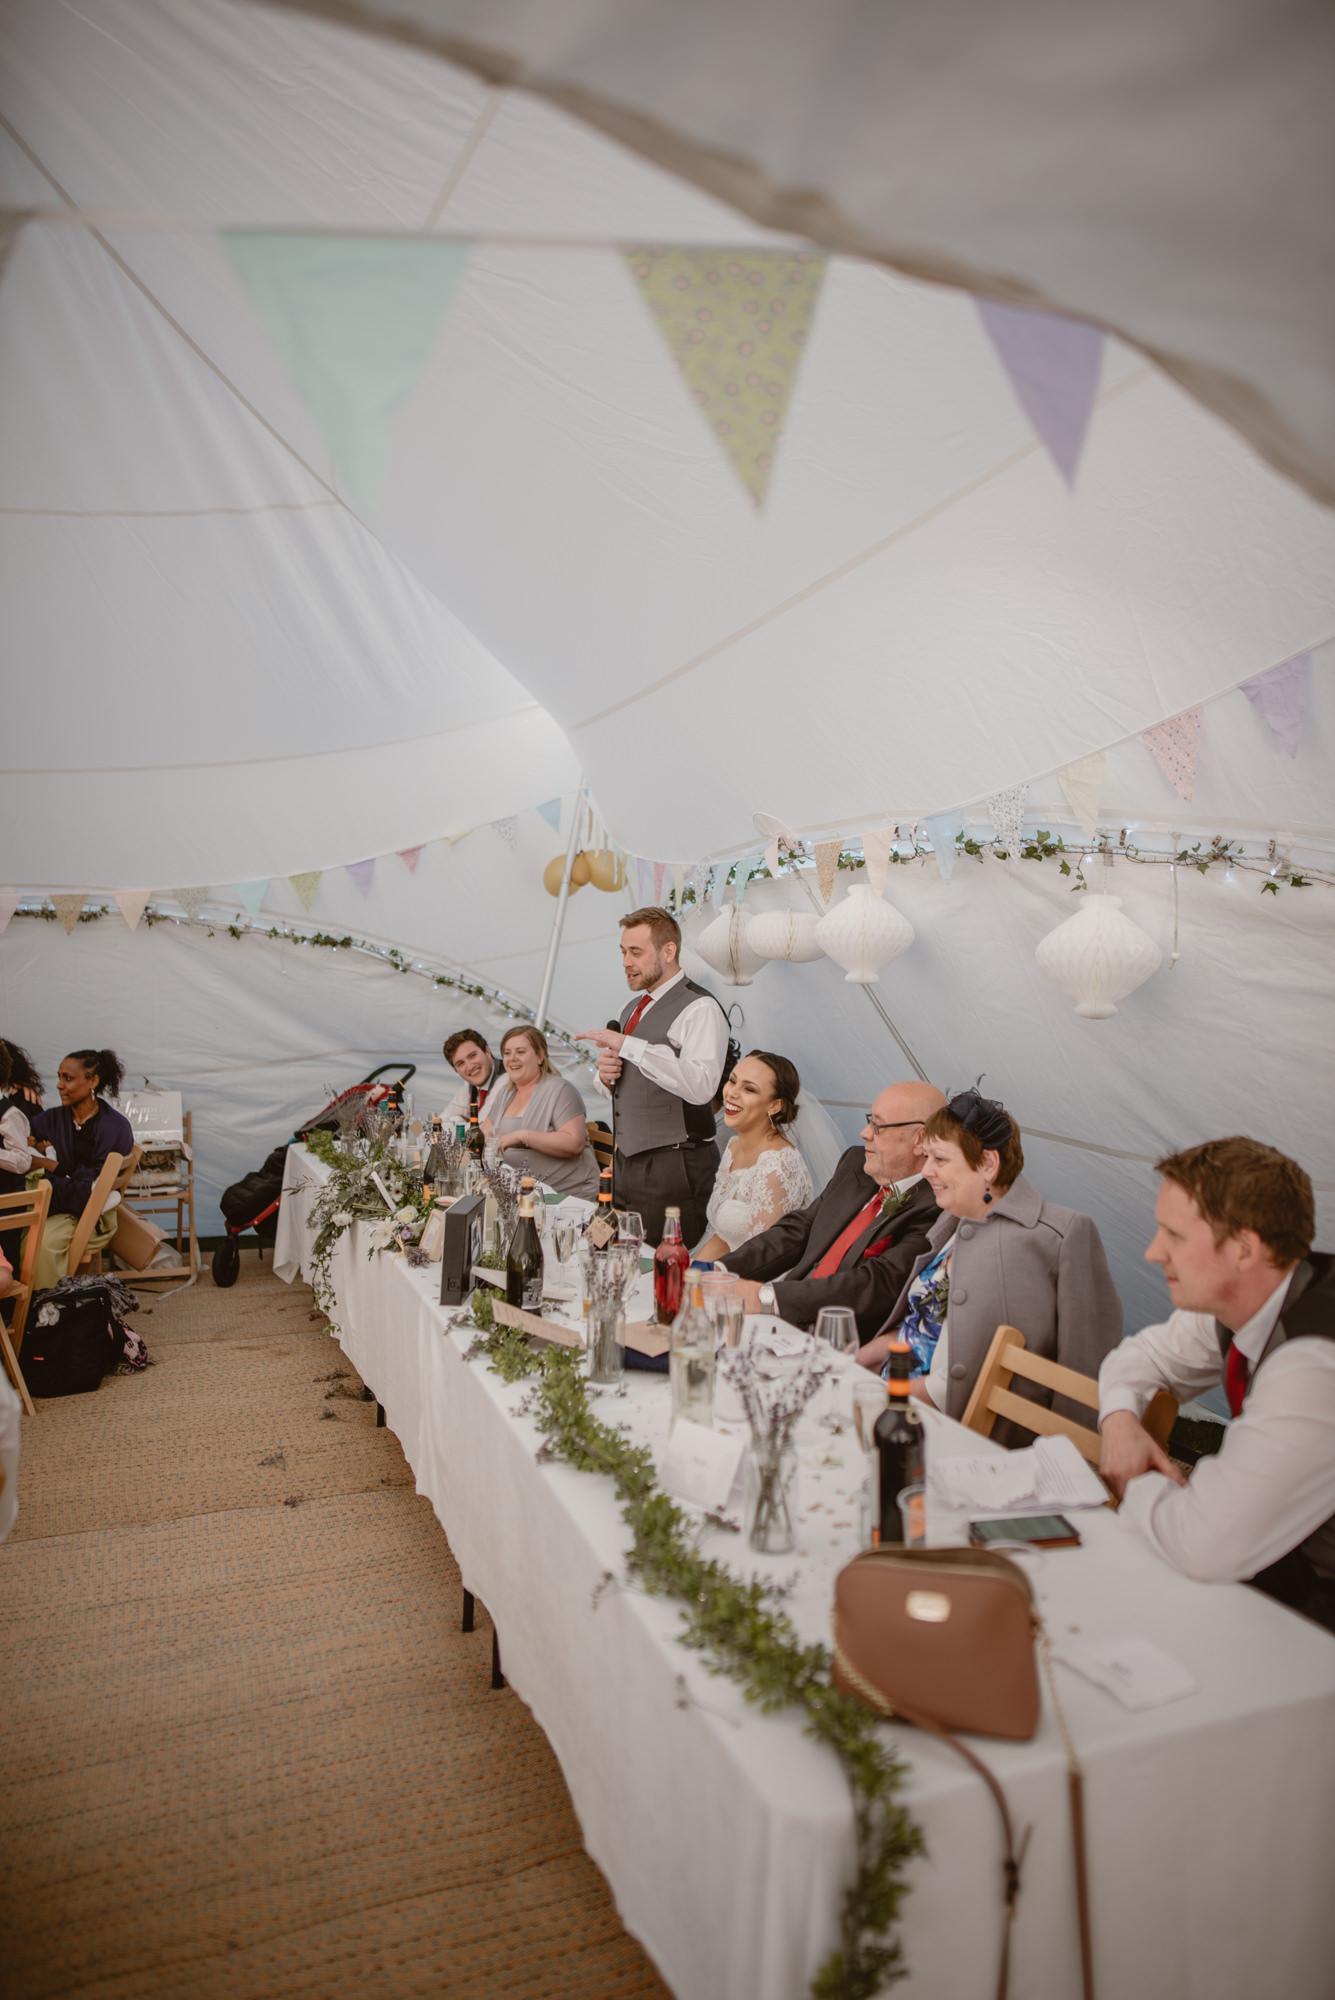 Jacqueline-Gareth-Wedding-Westmead-Events-Surrey-Manu-Mendoza-Wedding-Photography-409.jpg